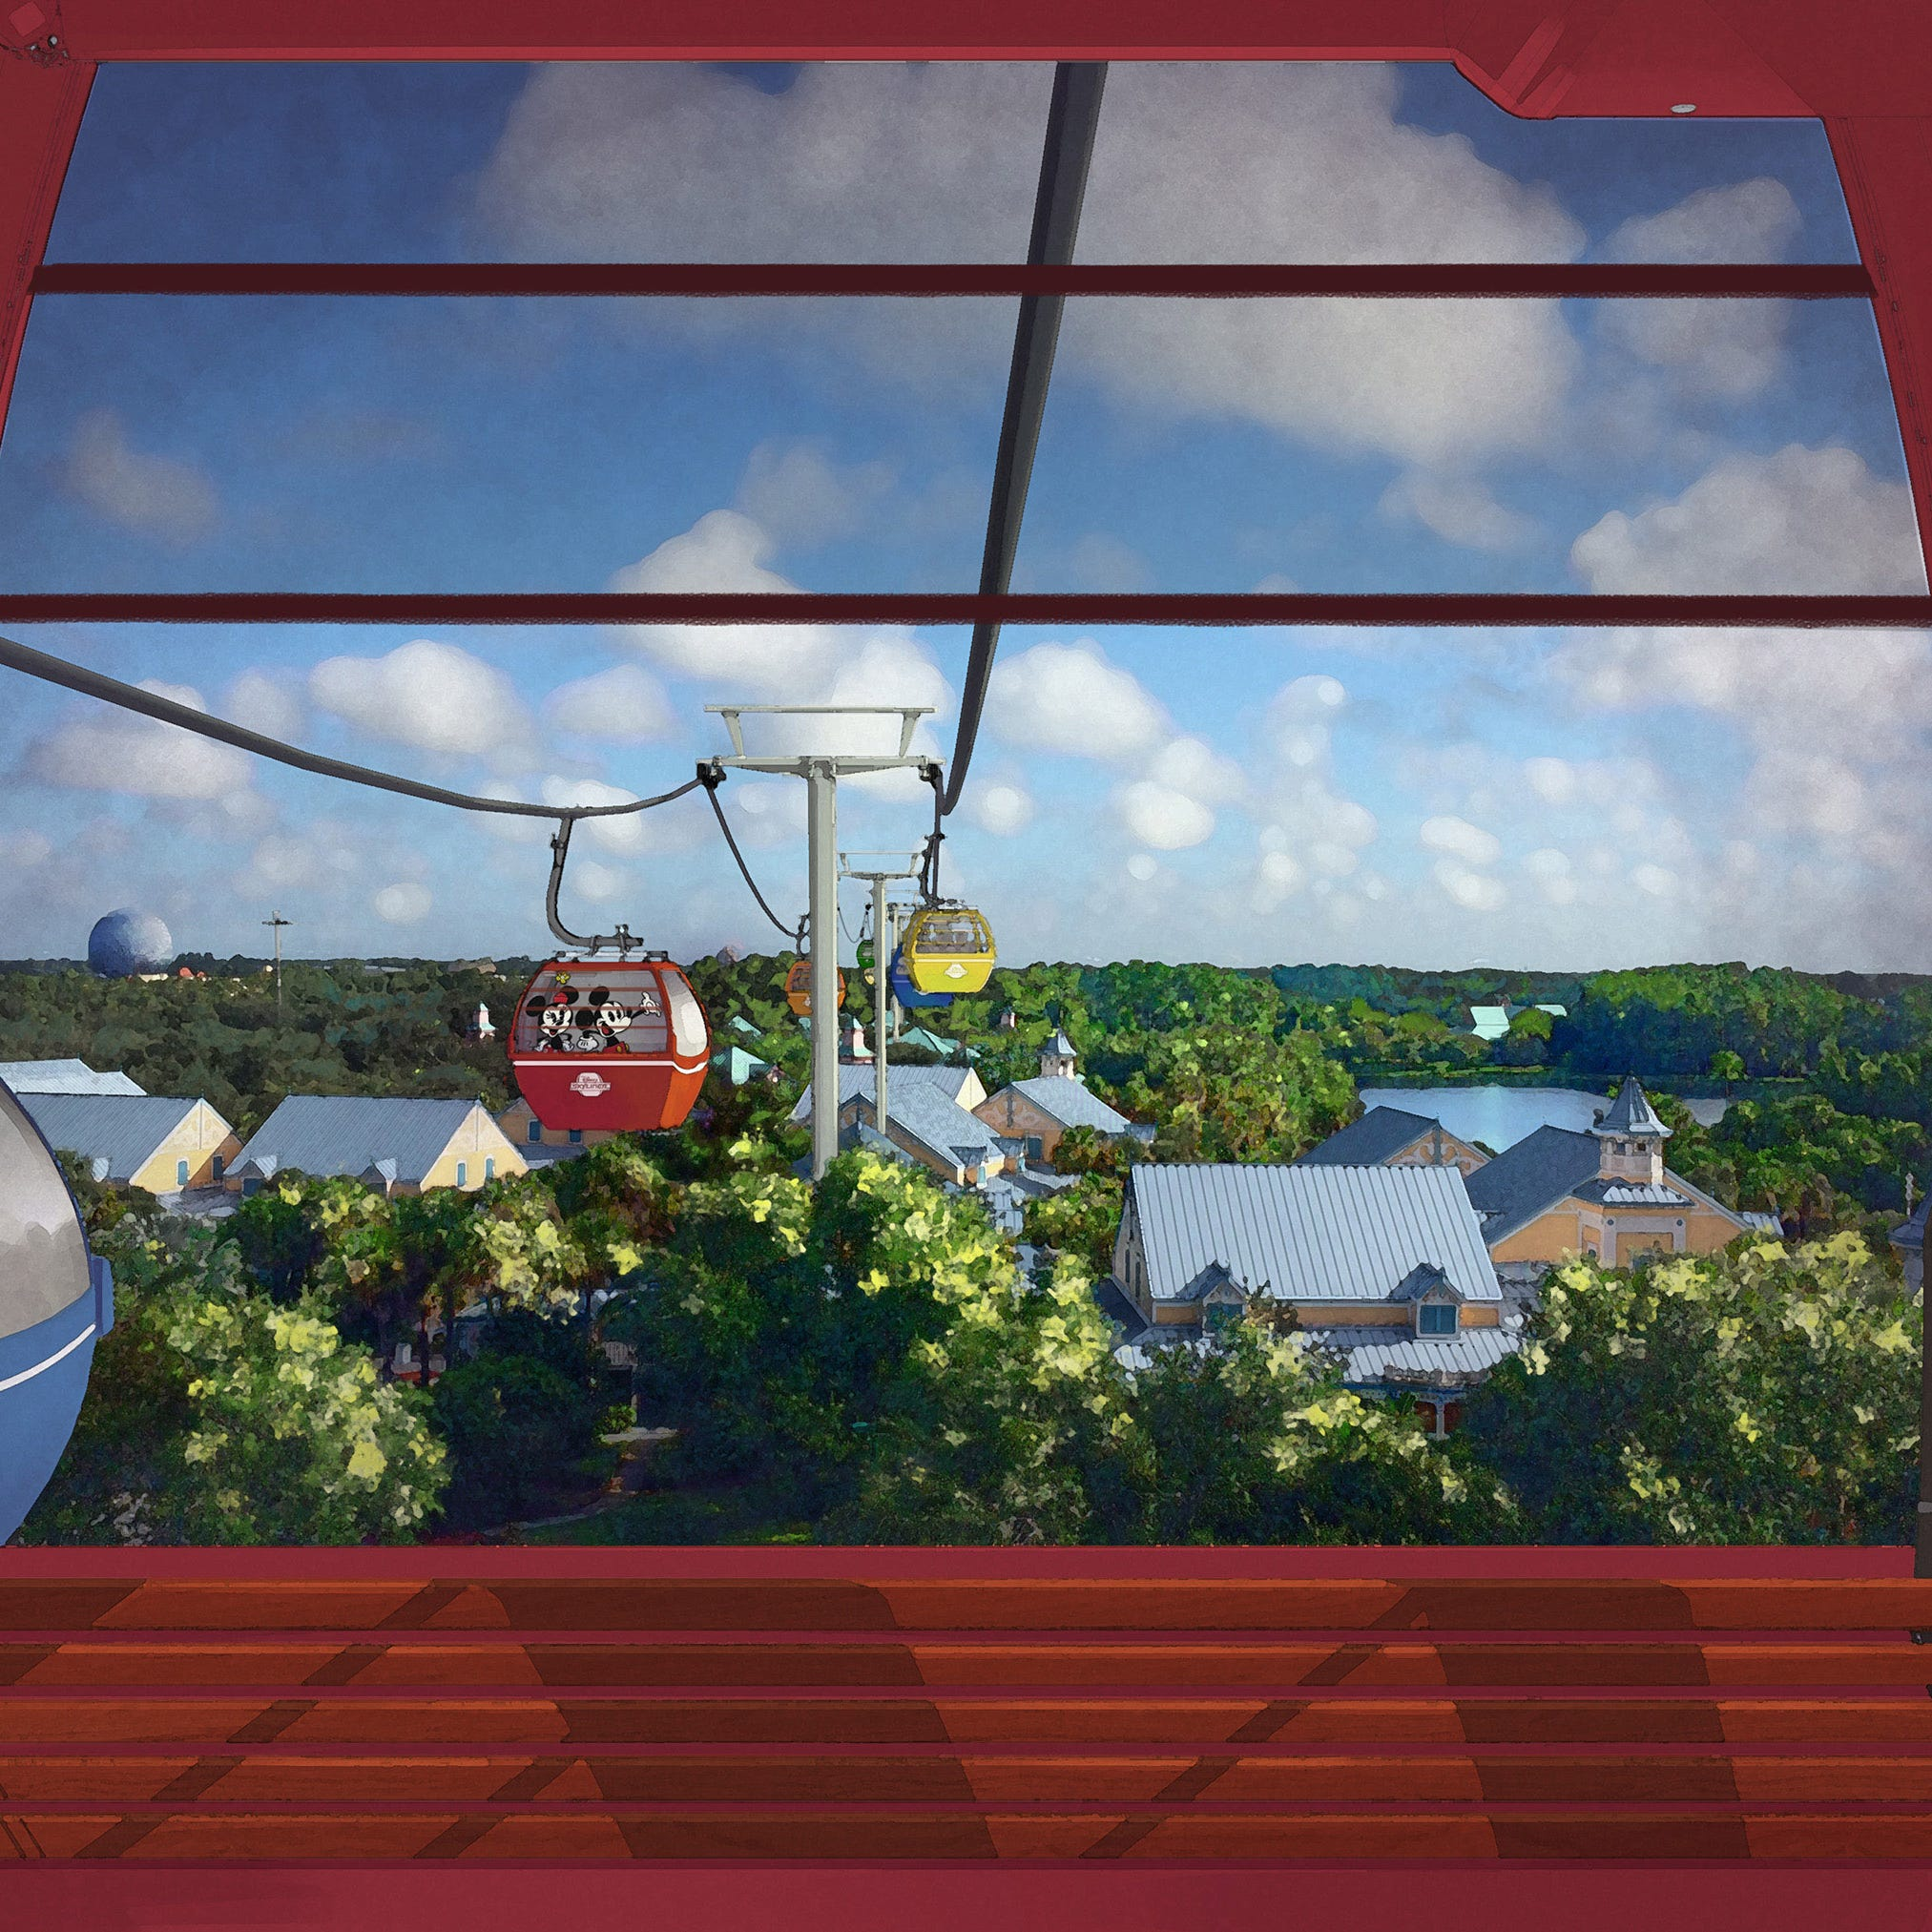 Disney's new Skyliner gondolas in Orlando make first test run